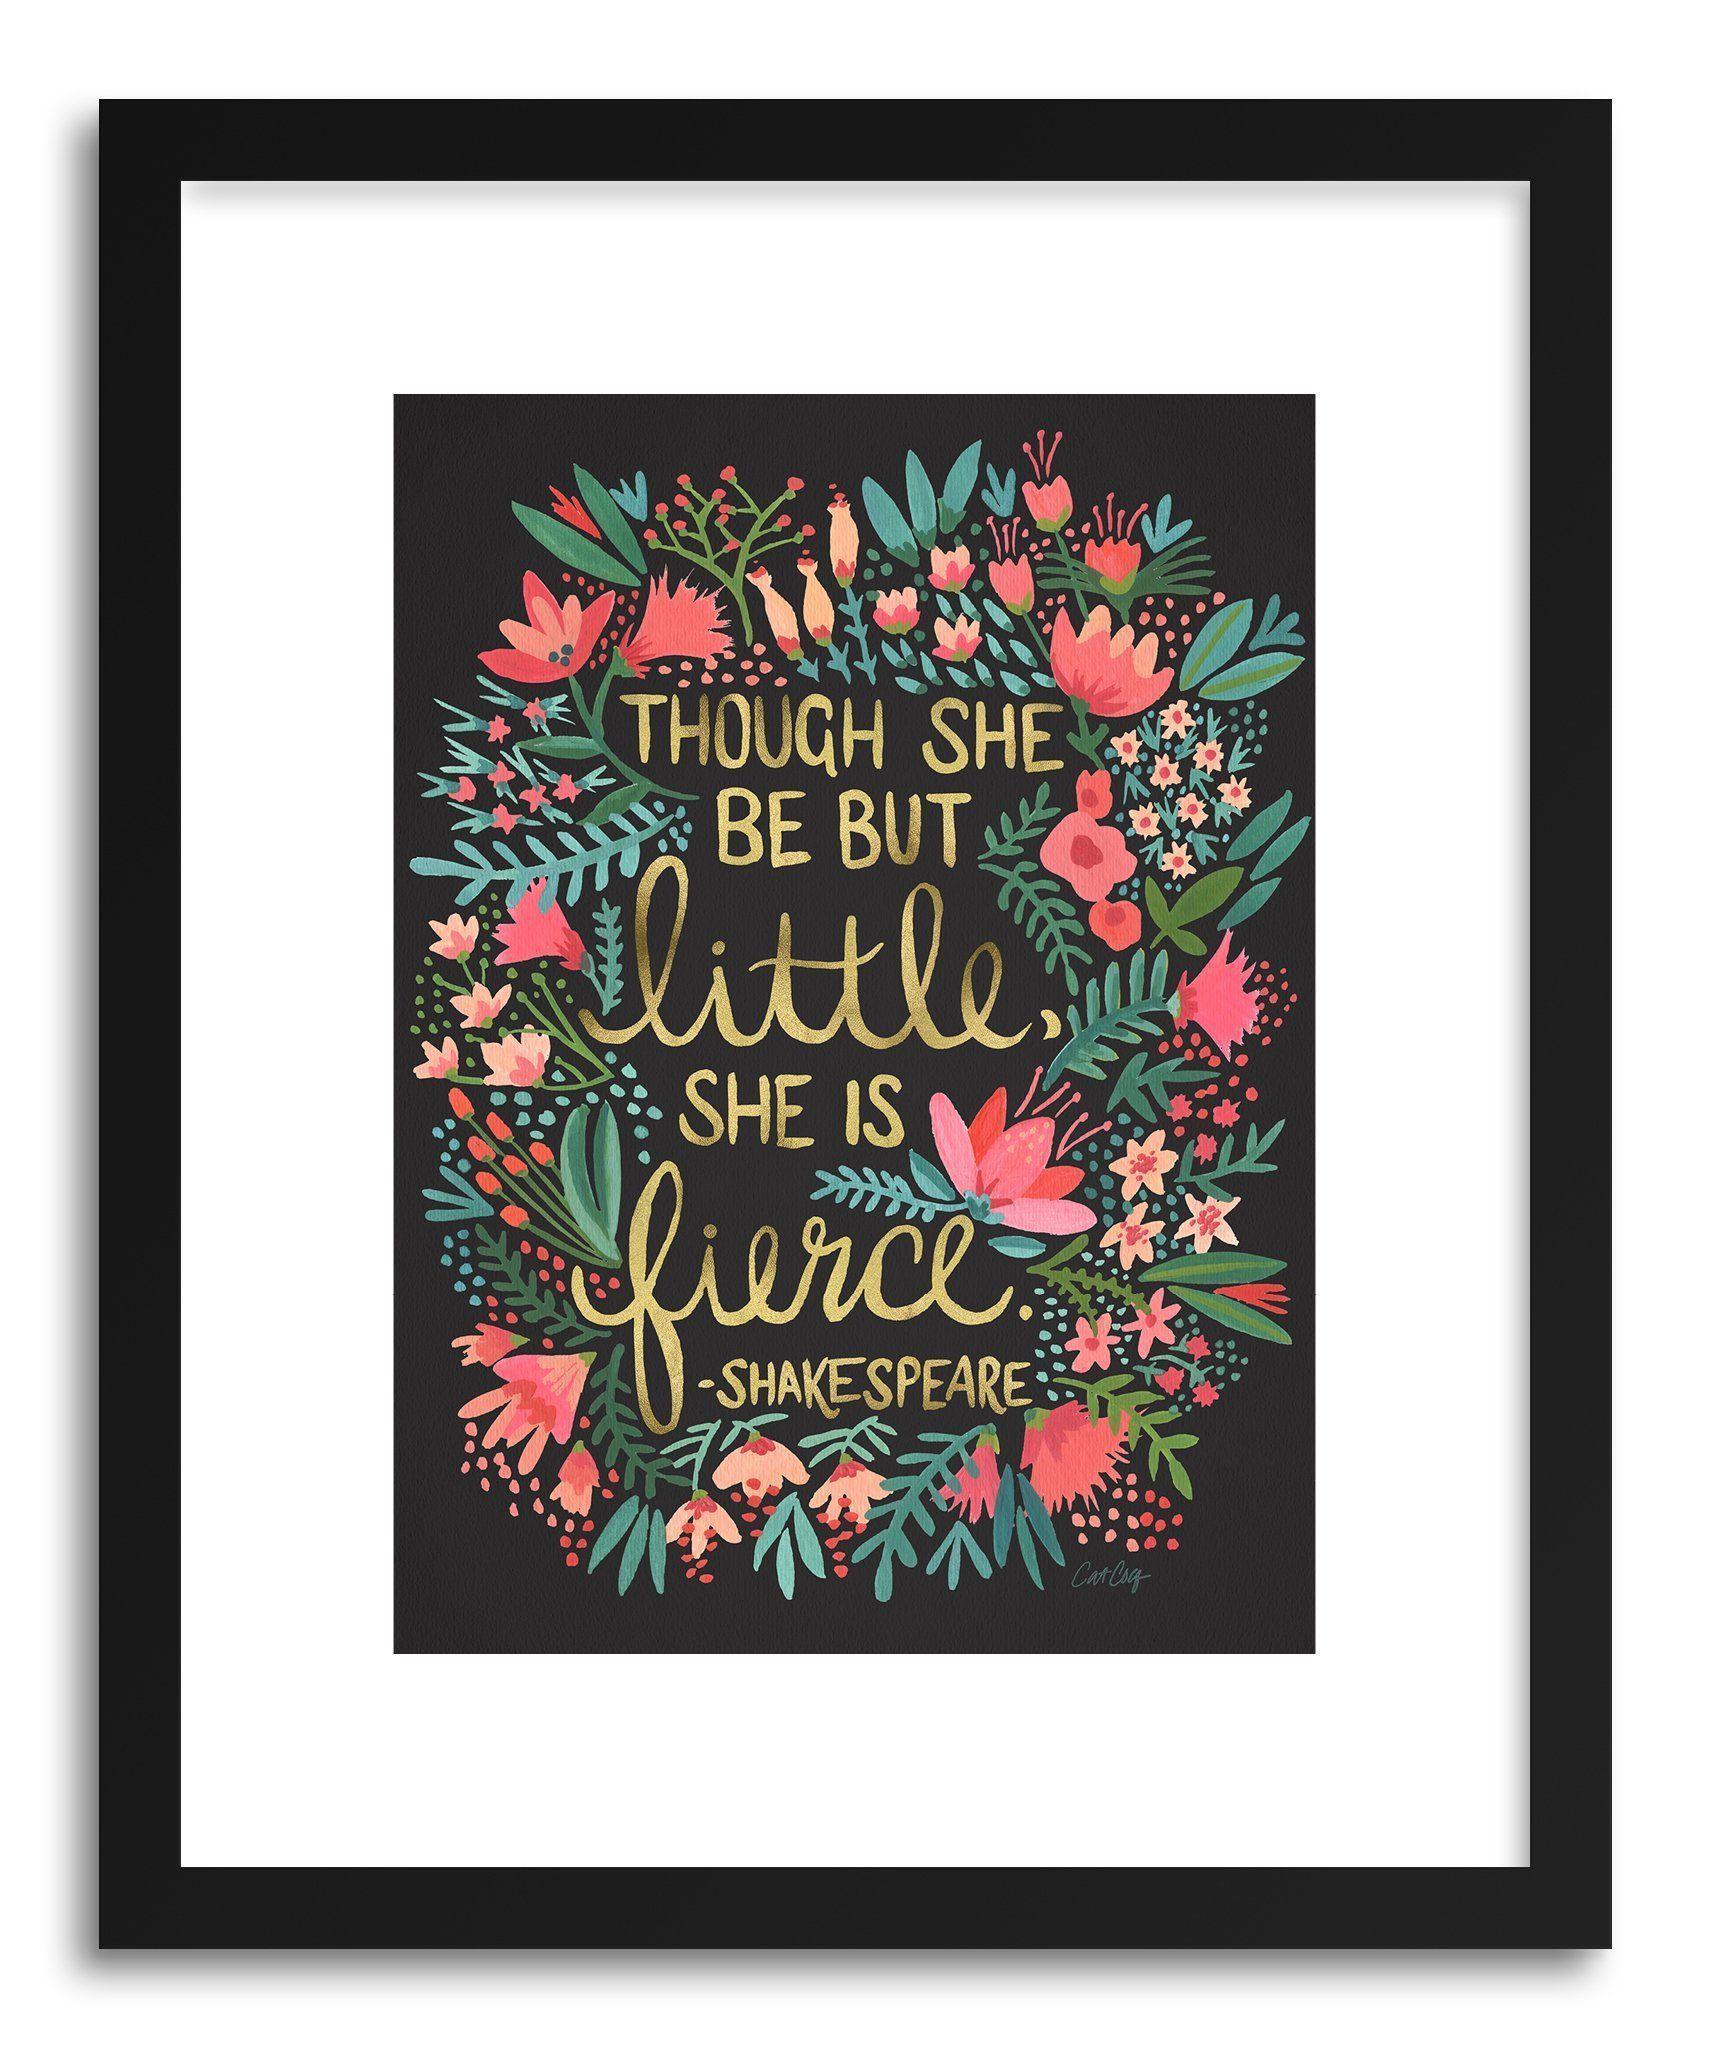 Little Fierce Charcoal | Products | Pinterest